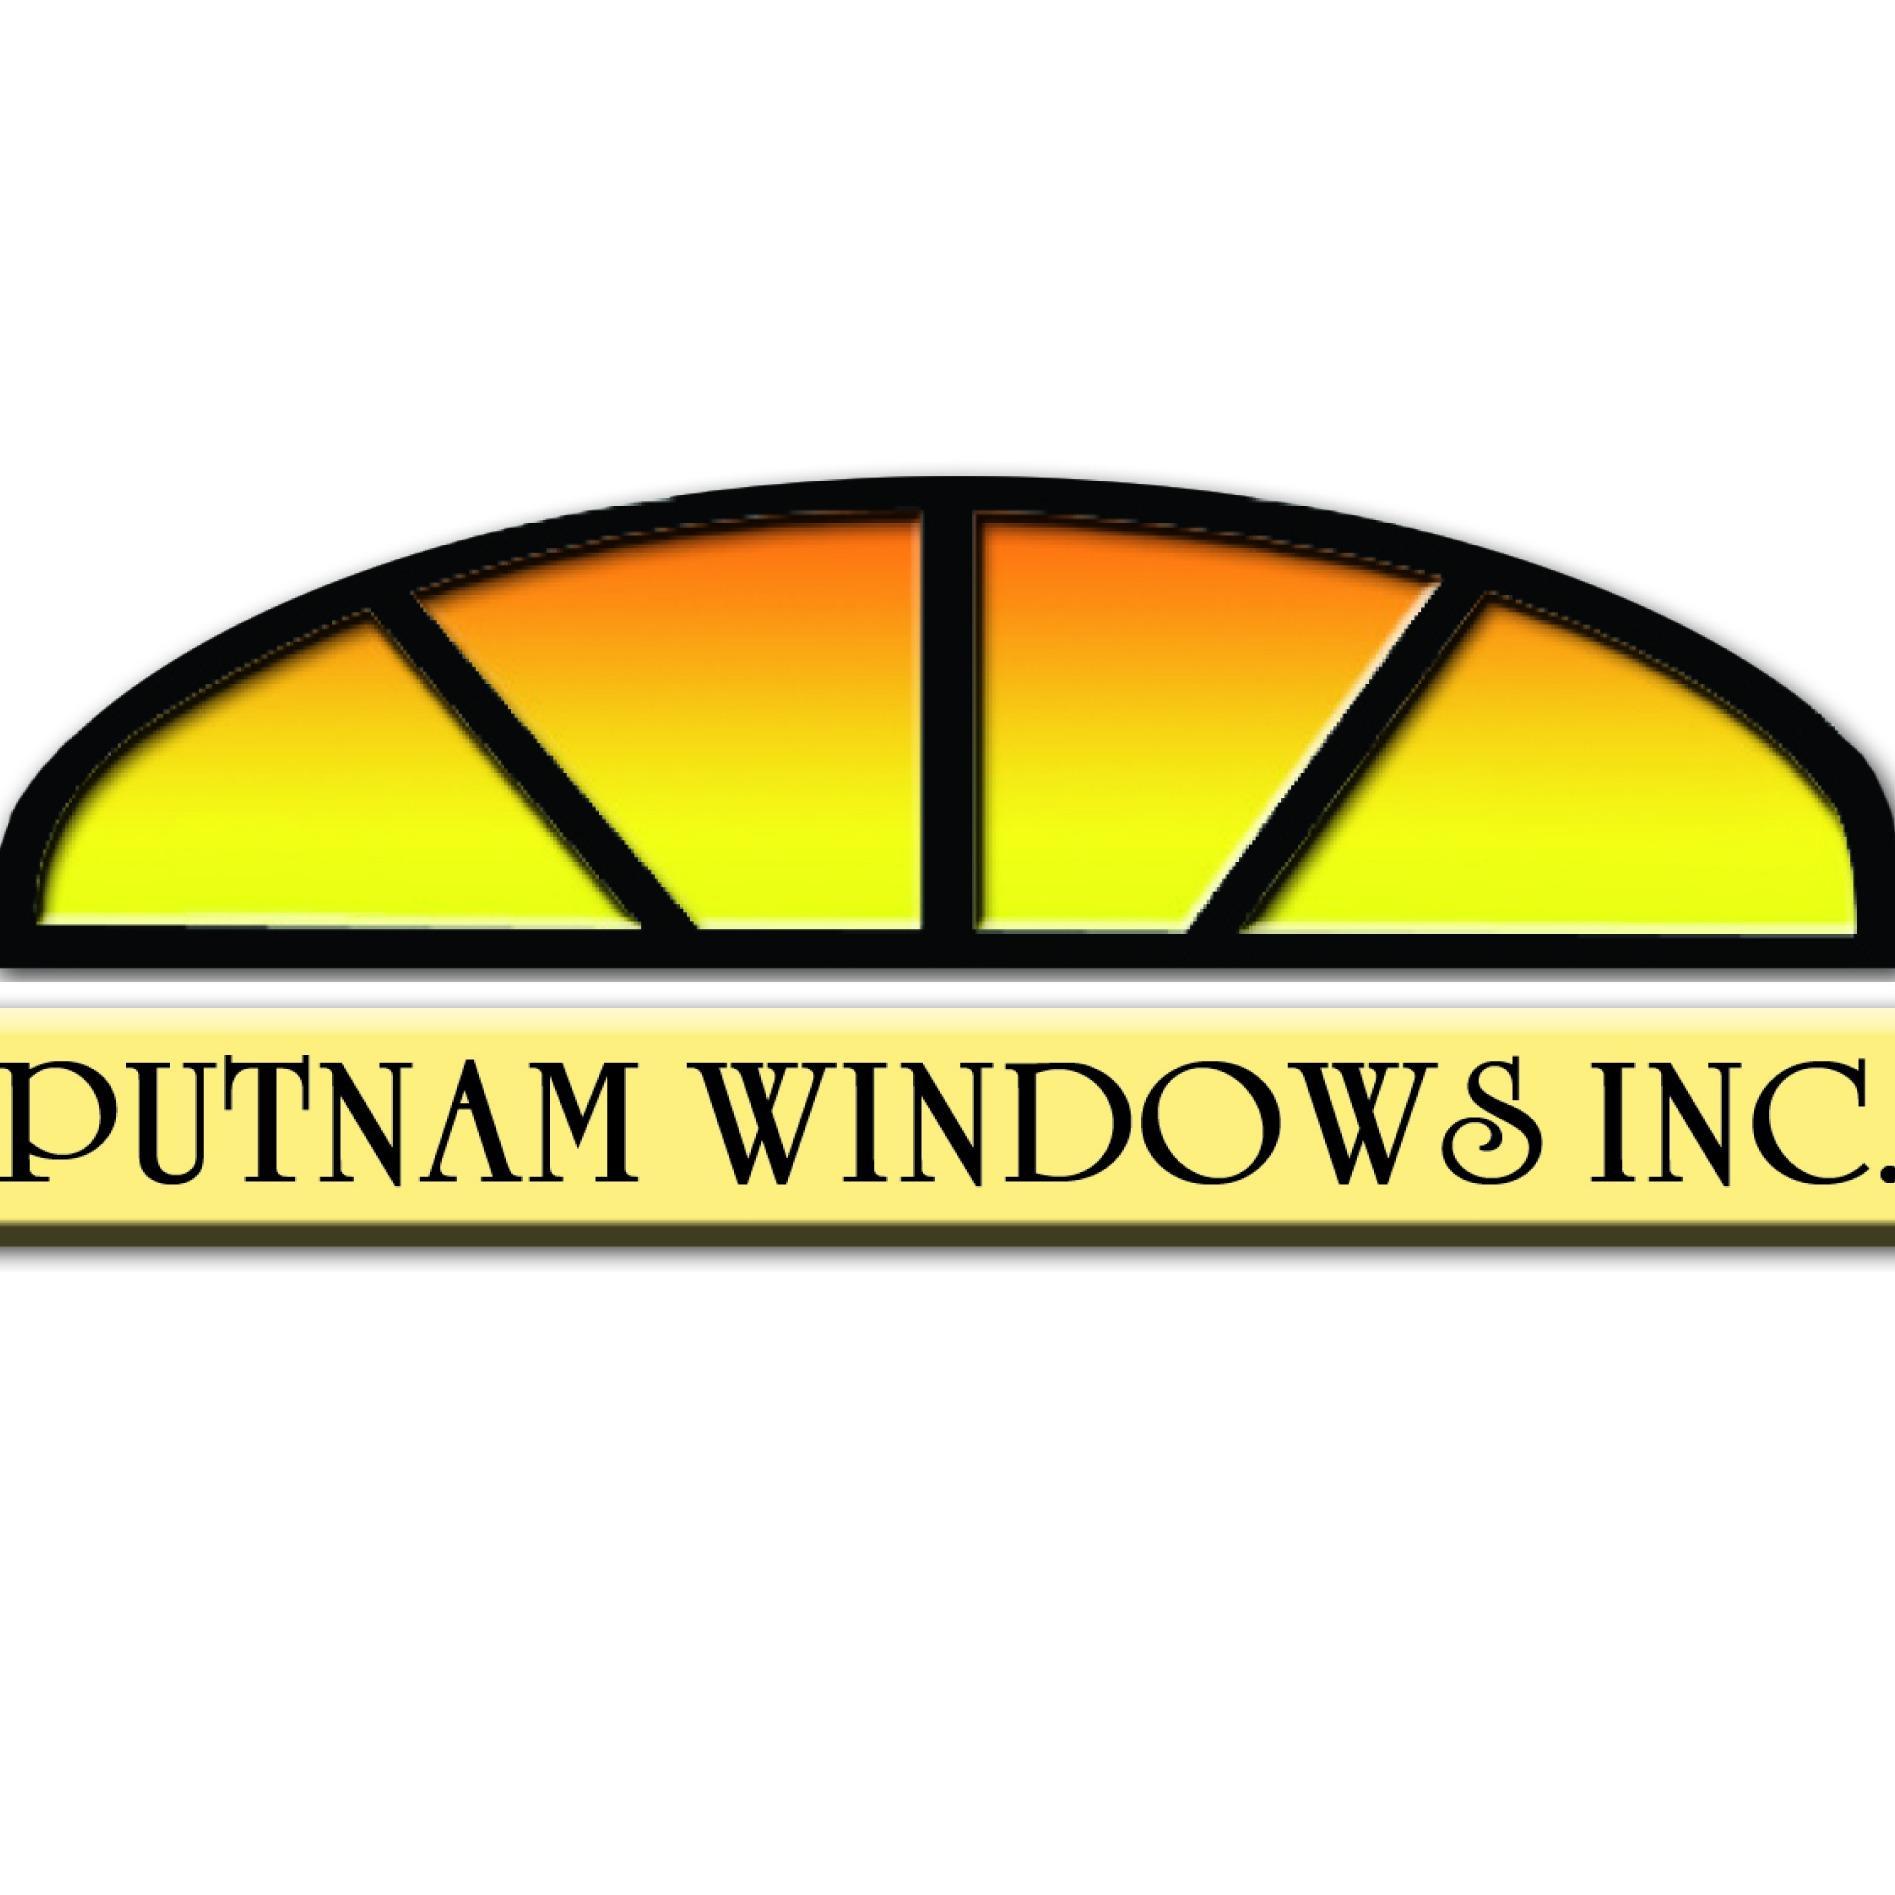 Putnam Windows Inc.